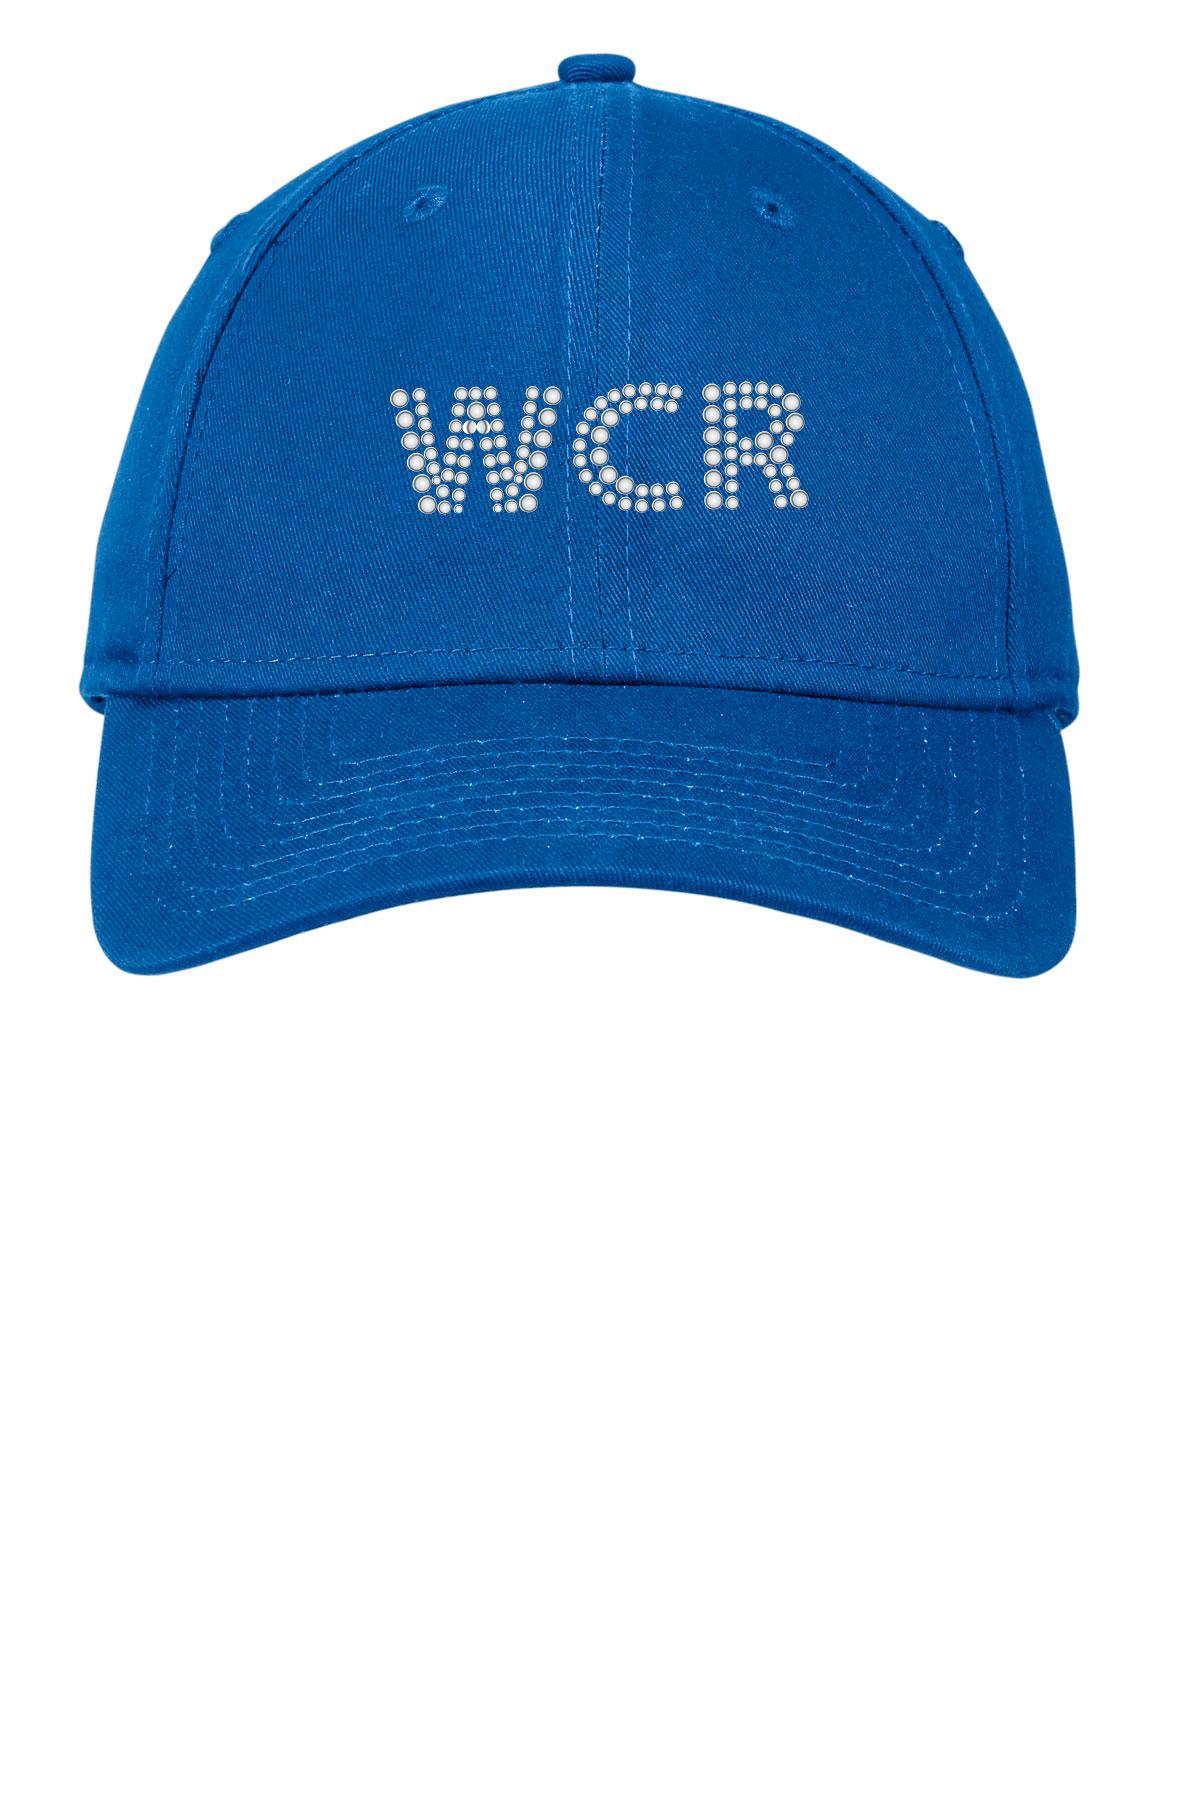 New Era - Adjustable Structured Cap - WCG3230